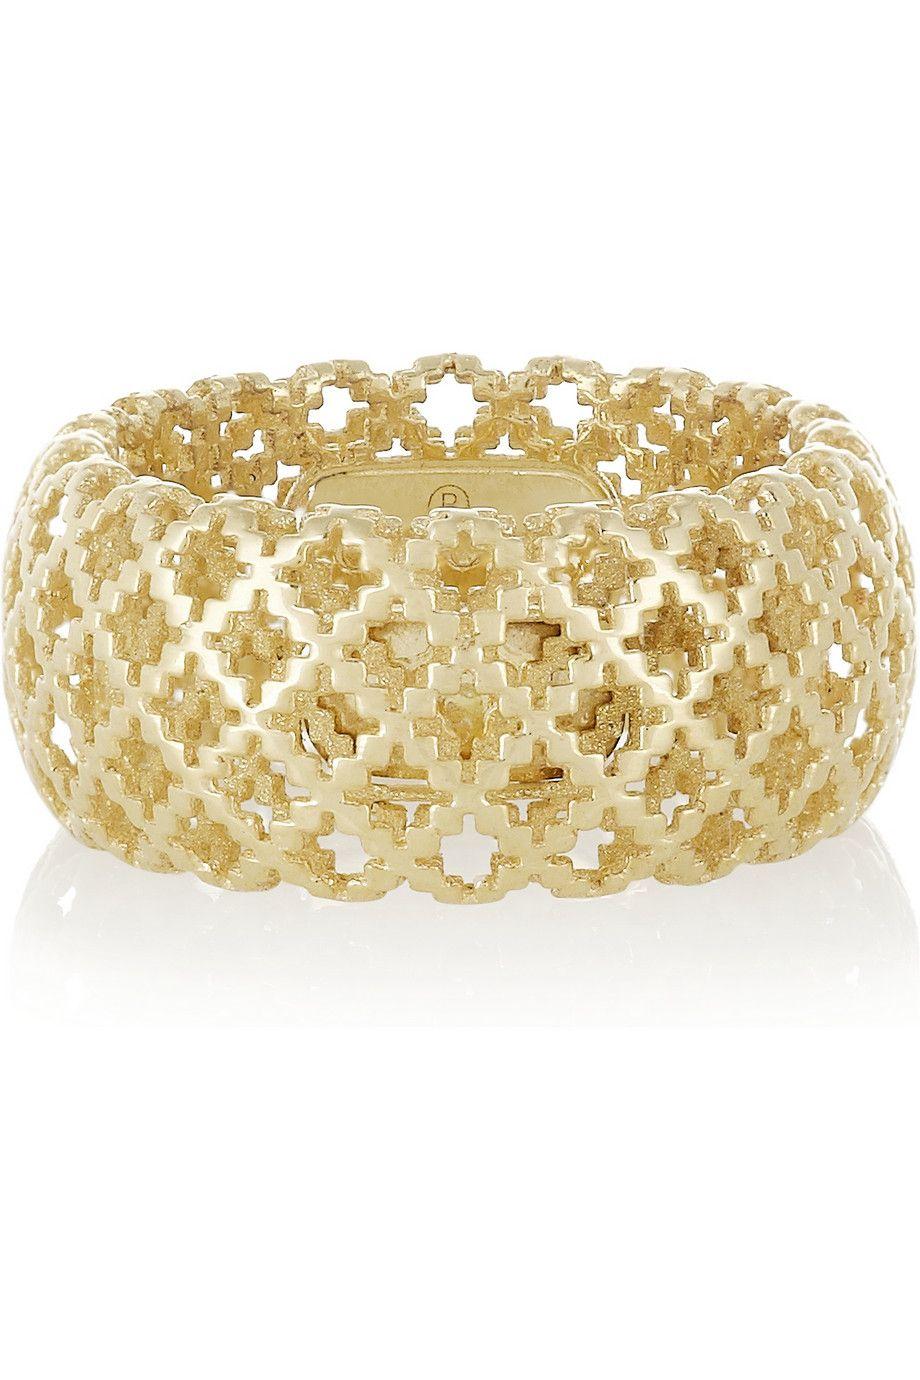 7d85c6a93 Gucci | Diamantissima 18-karat gold ring | NET-A-PORTER.COM | w.t.s. ...